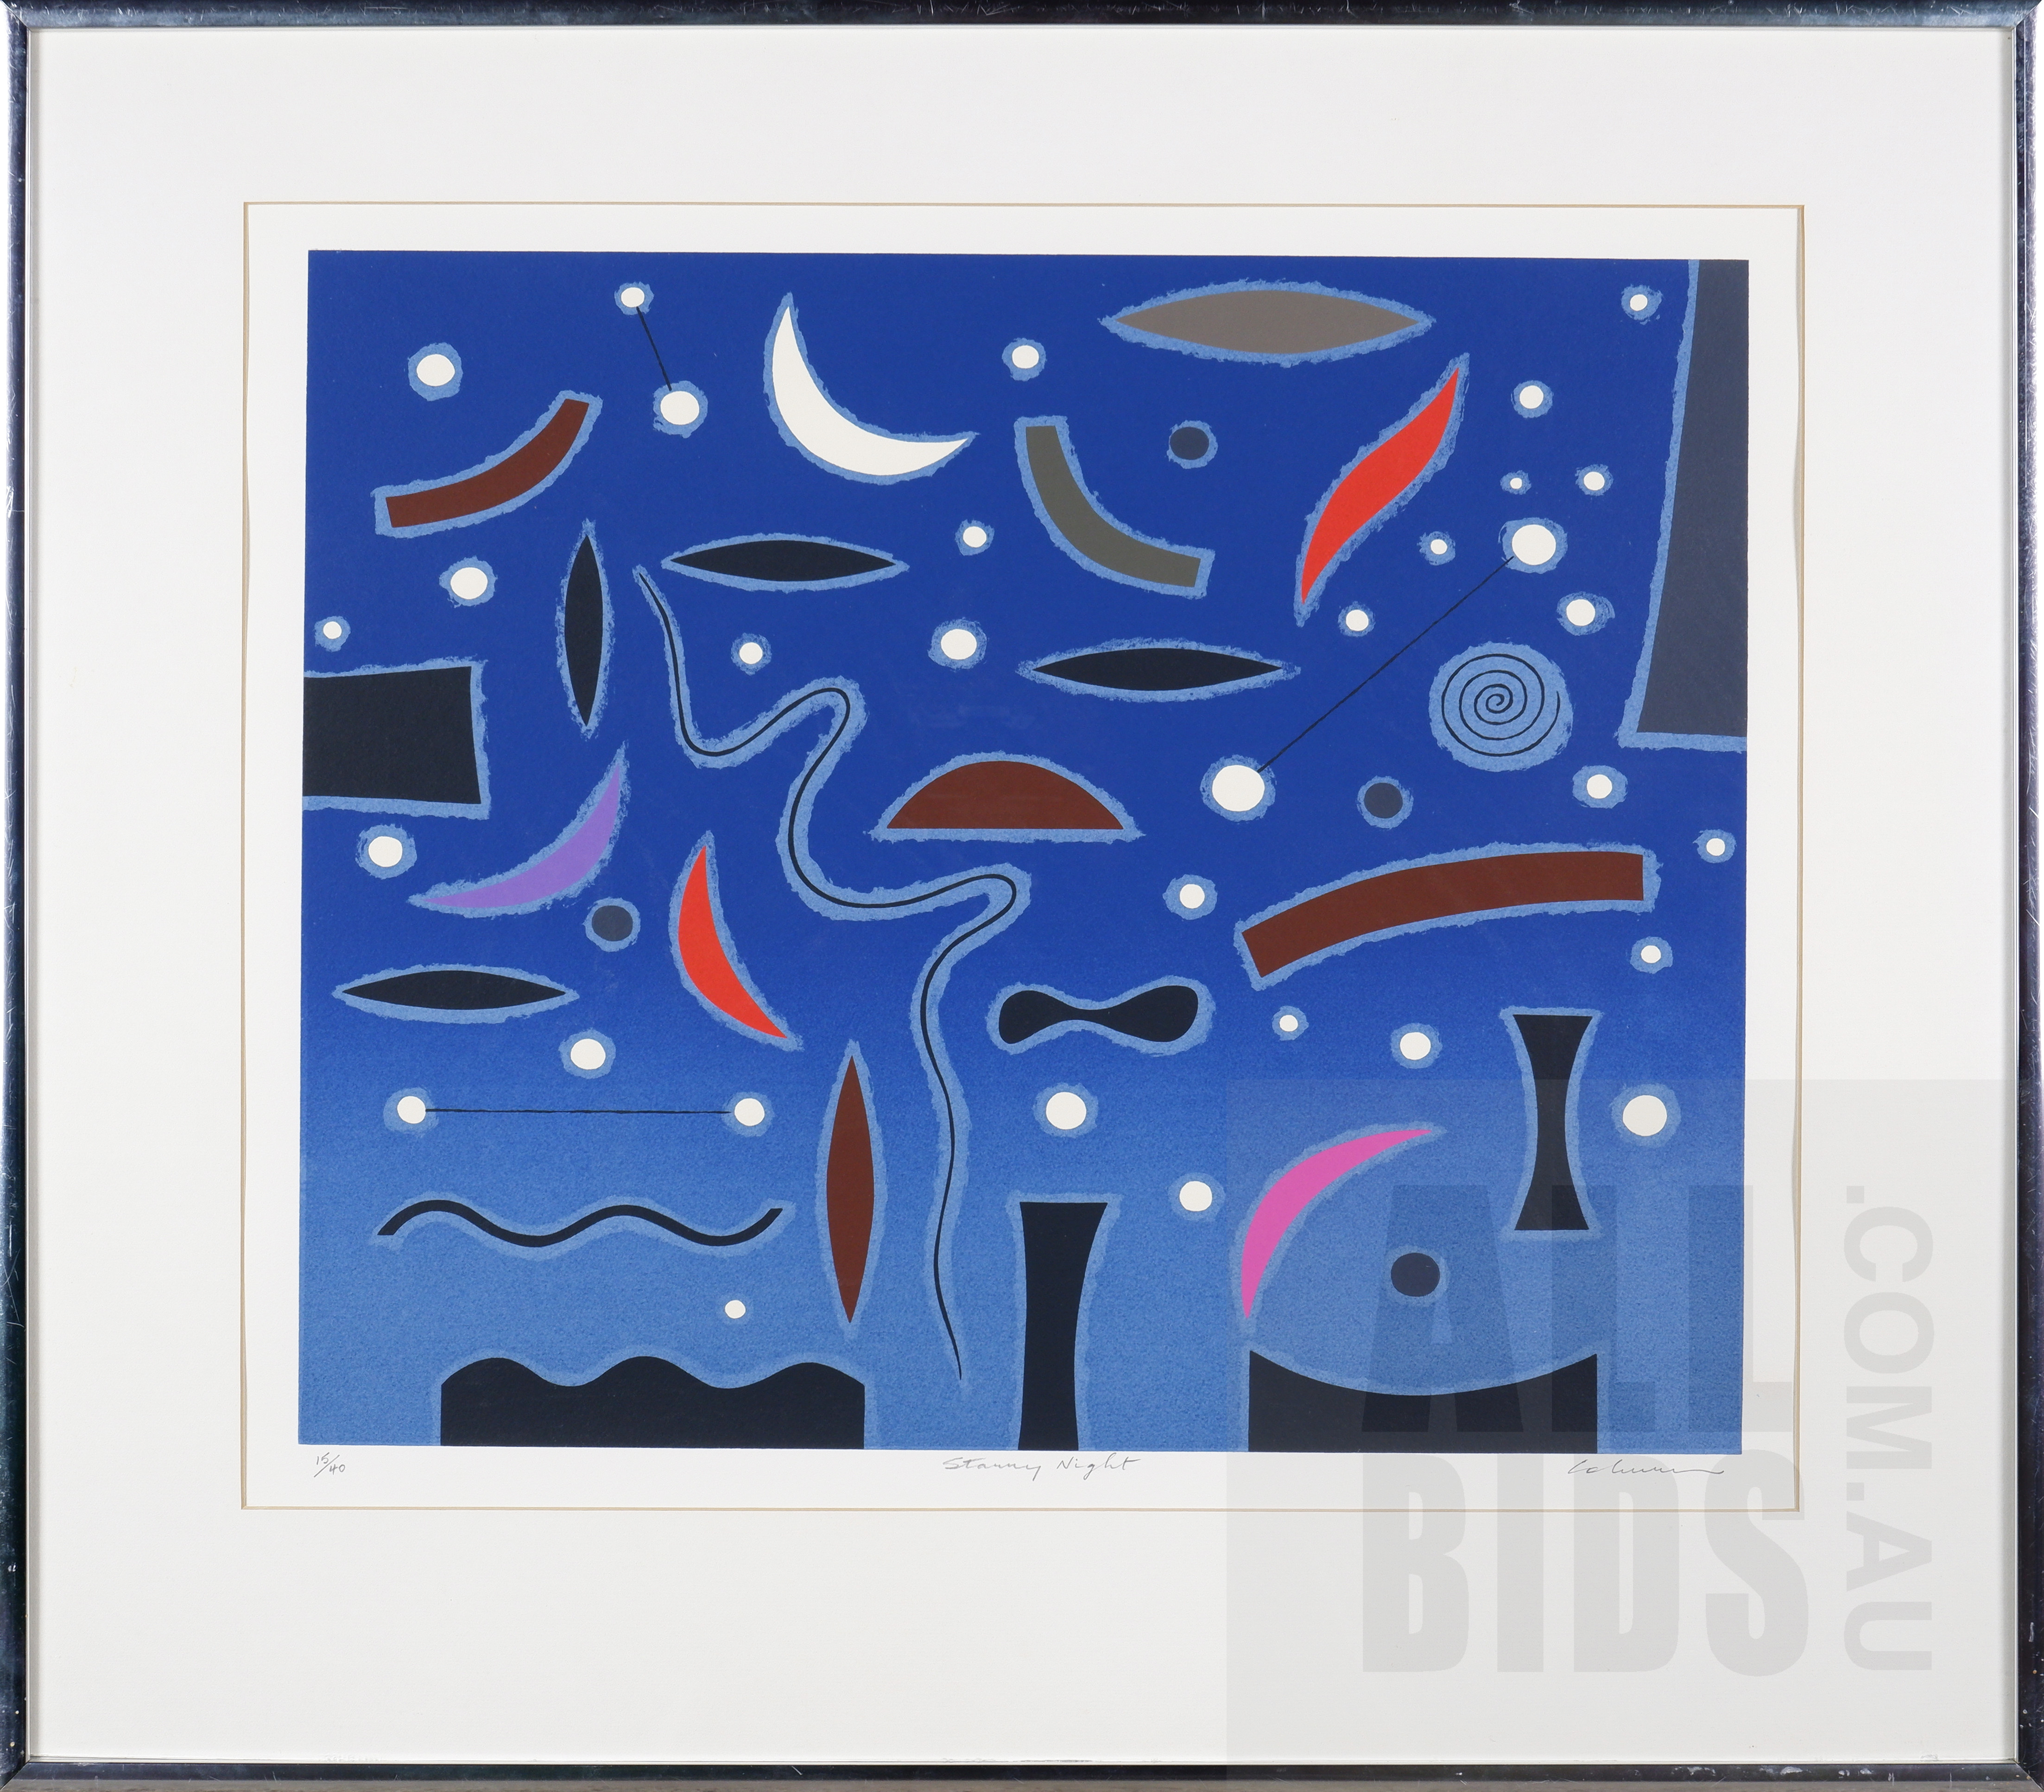 'John Coburn (1931-1986), Starry Night, Screenprint, 47 x 58 cm (image size)'